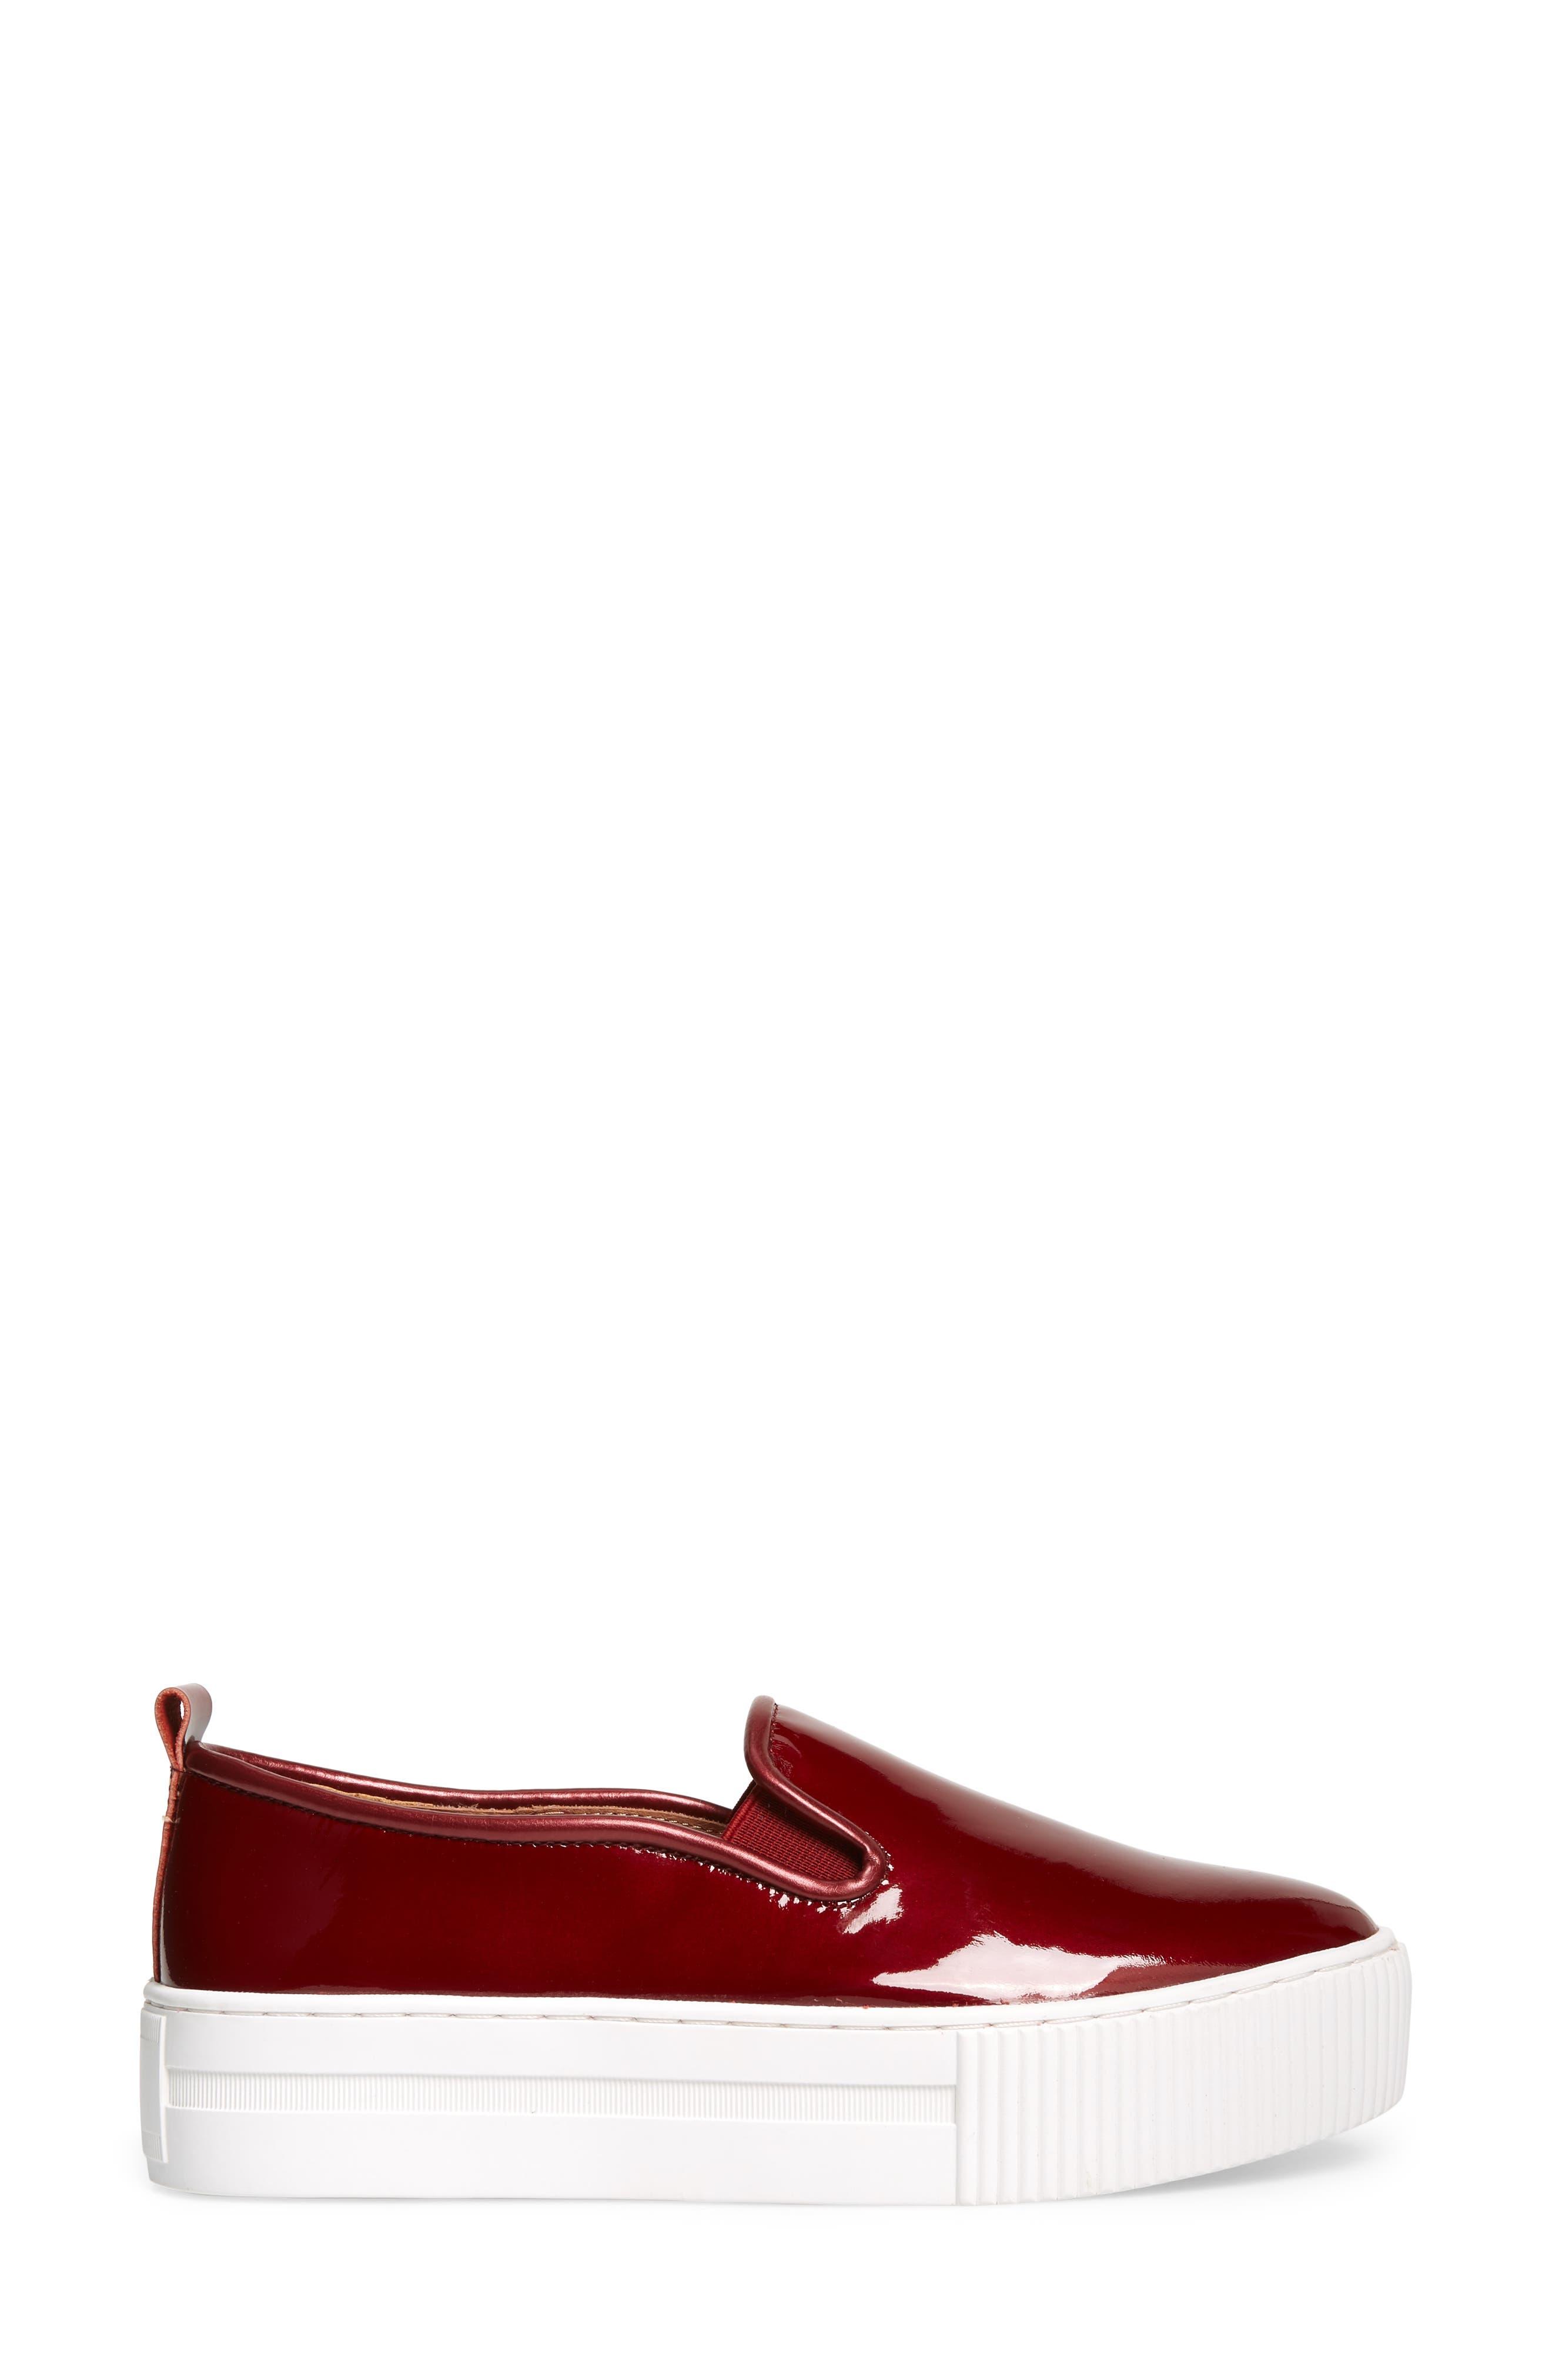 Baylee Platform Slip-On Sneaker,                             Alternate thumbnail 3, color,                             930